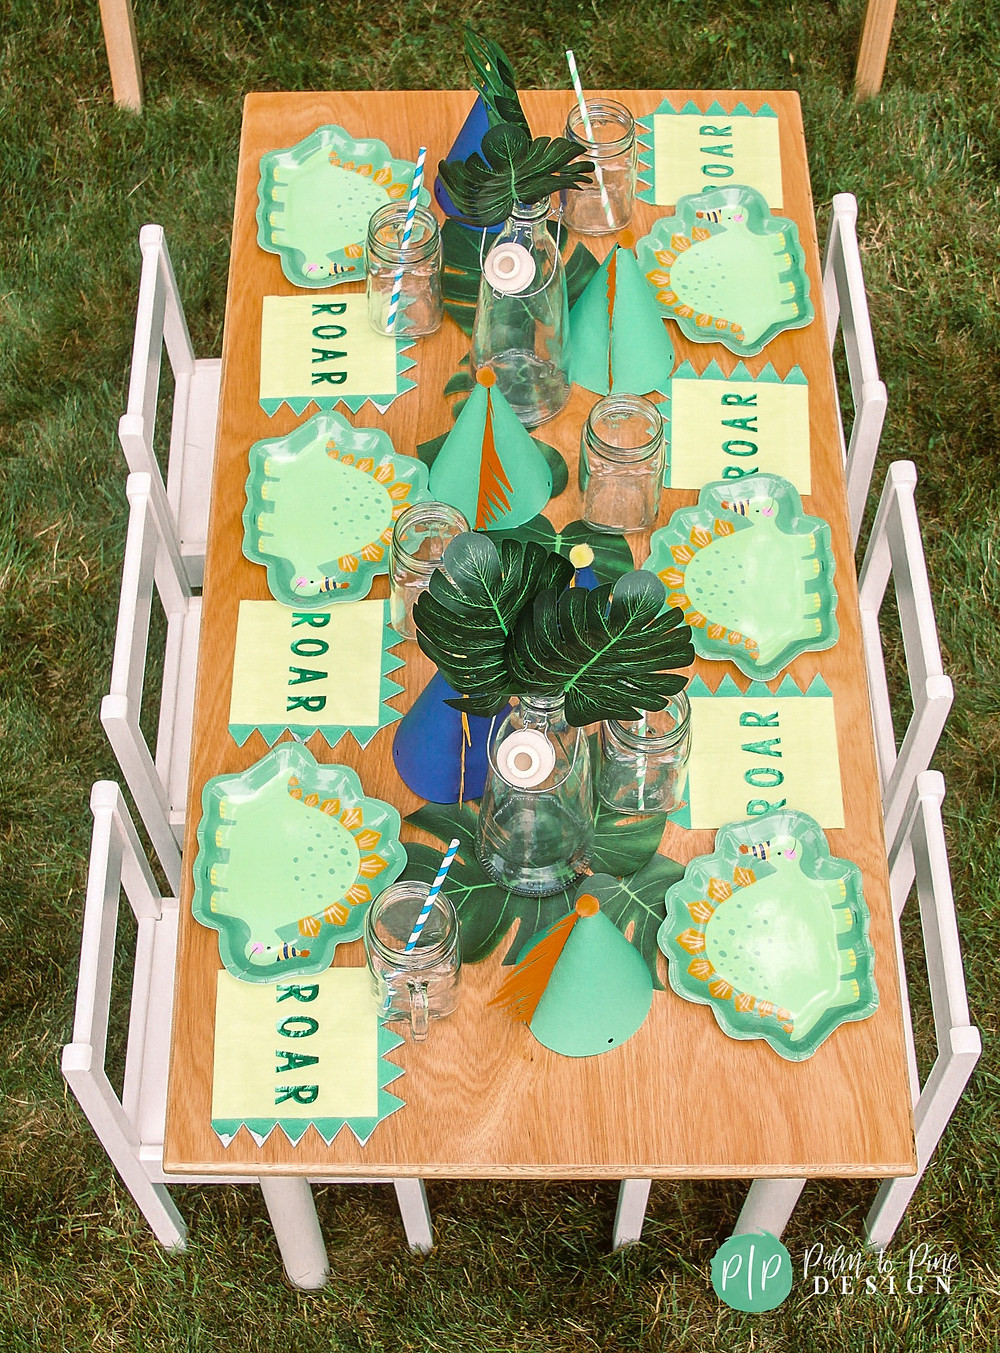 dinosaur party table top, dino table settings, dinosaur birthday plates